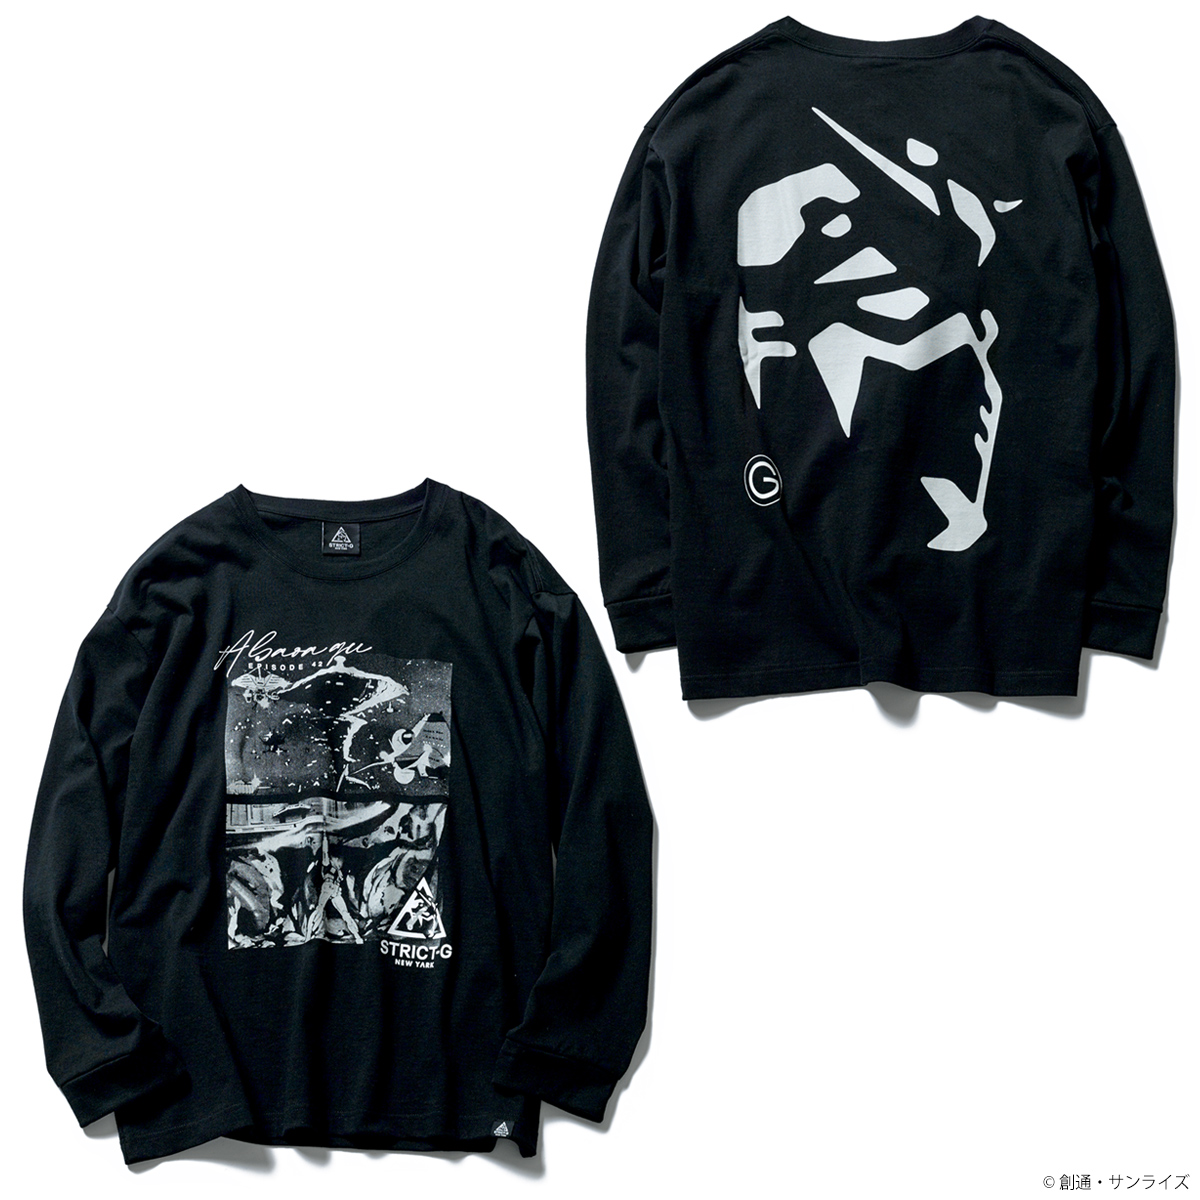 STRICT-G NEW YARK 長袖ビッグTシャツ A BAOA QU